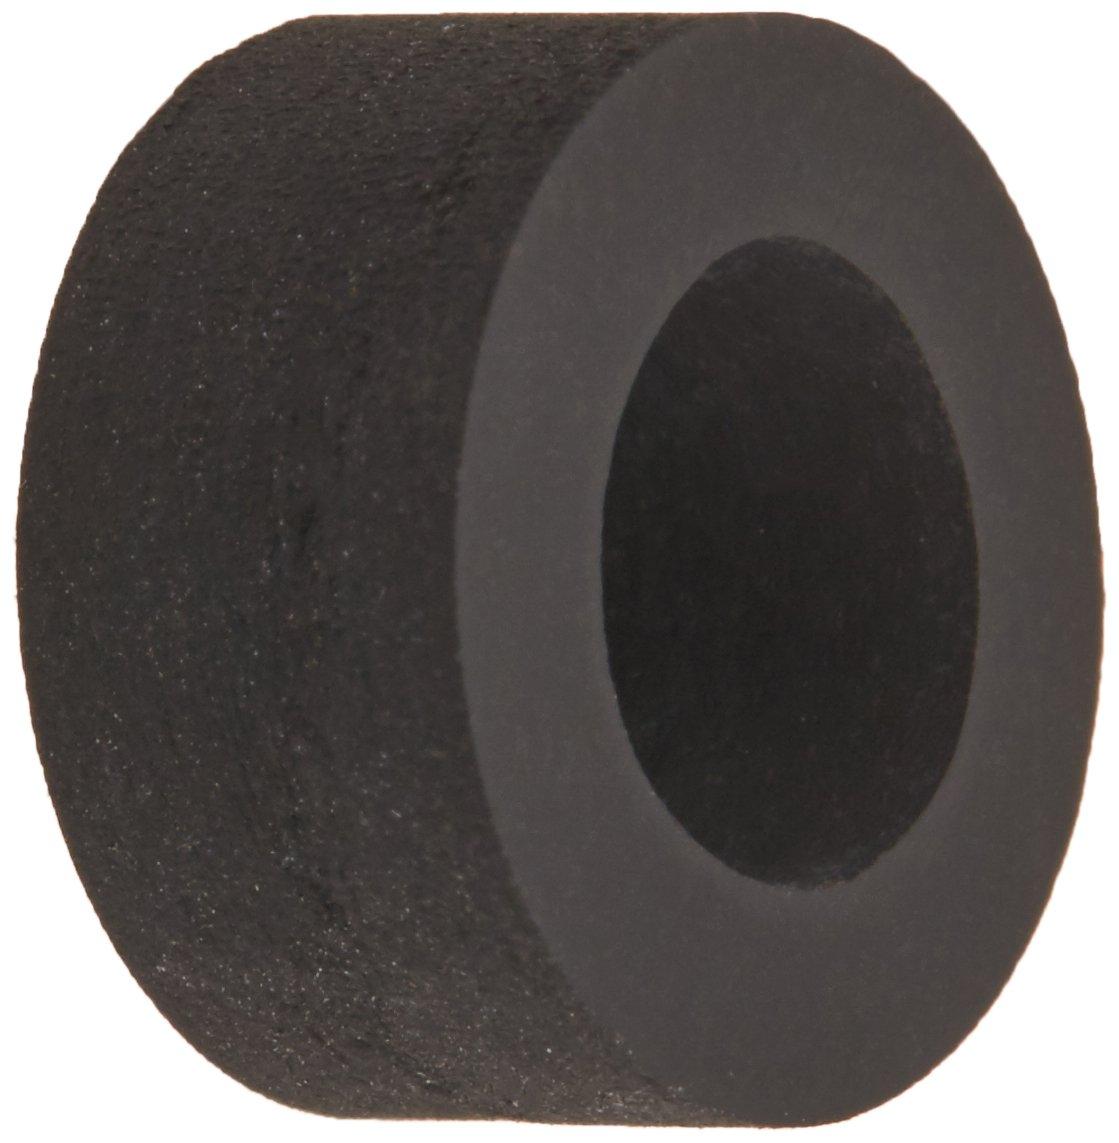 5//16 Compression Tube Fluorocarbon Pack of 20 Parker Hannifin 60VLV-5-pk20 Air Brake Sleeve Fitting